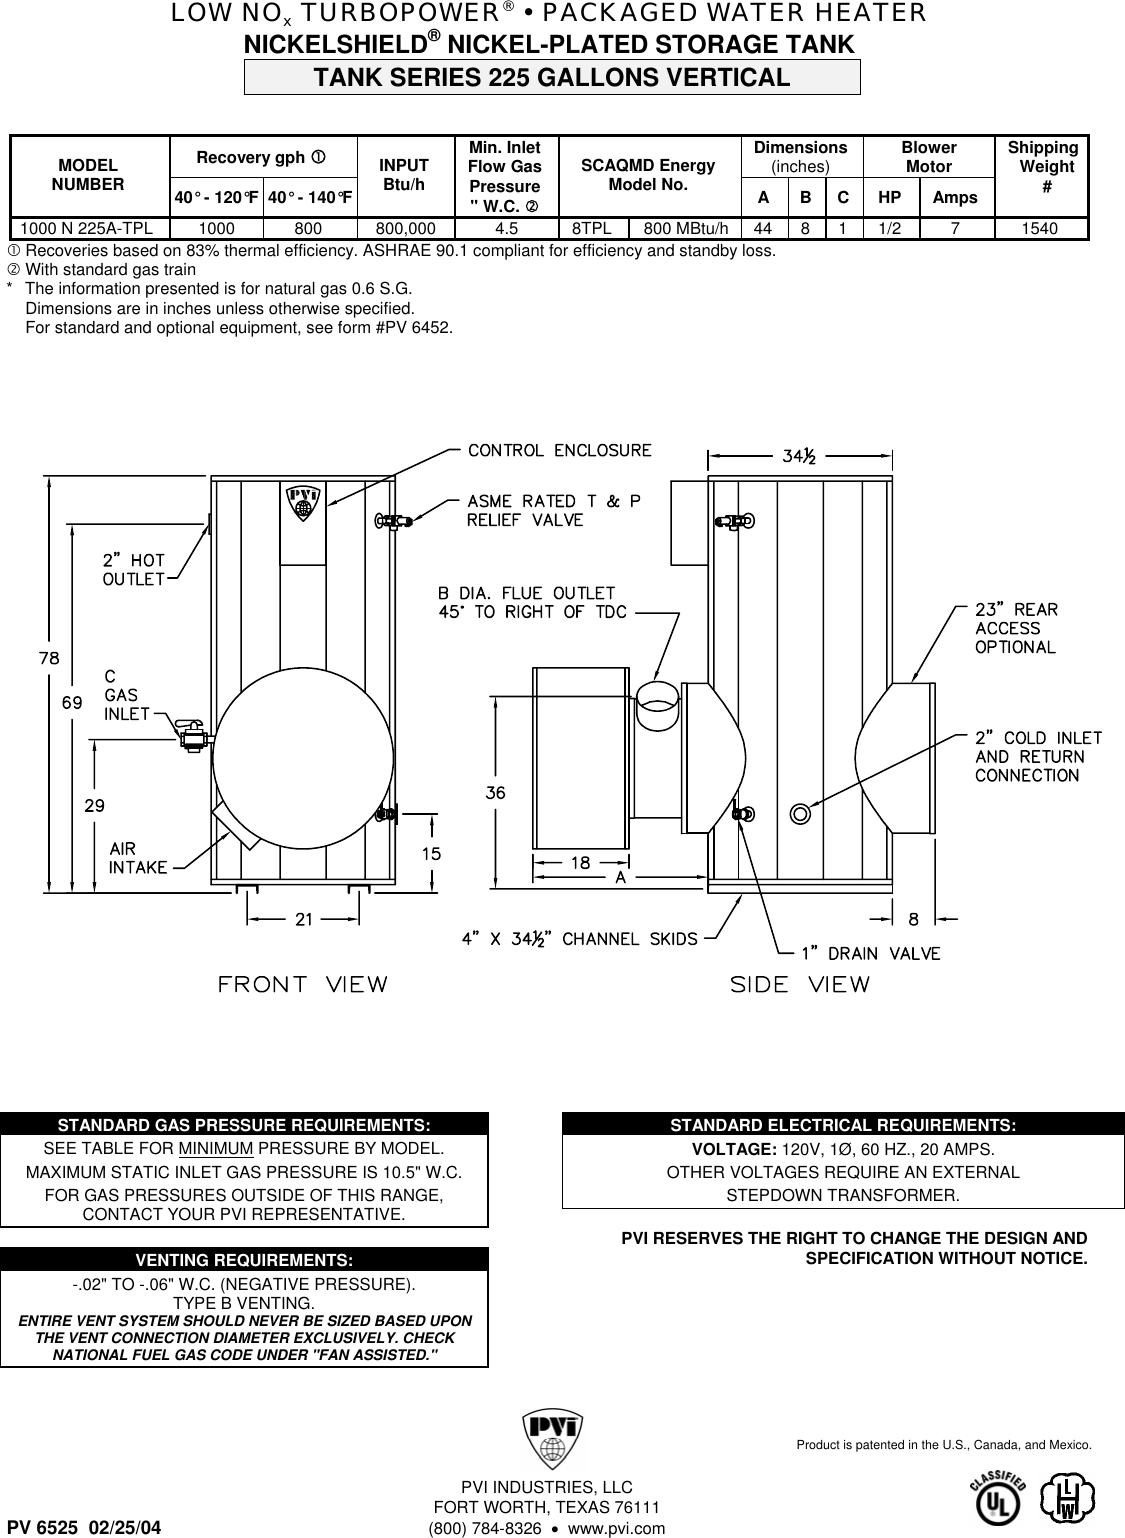 pvi industries 375p225a tpl users manual turbopower gas u2022 packaged rh usermanual wiki Pvis School Pvis Matthew Cartmill